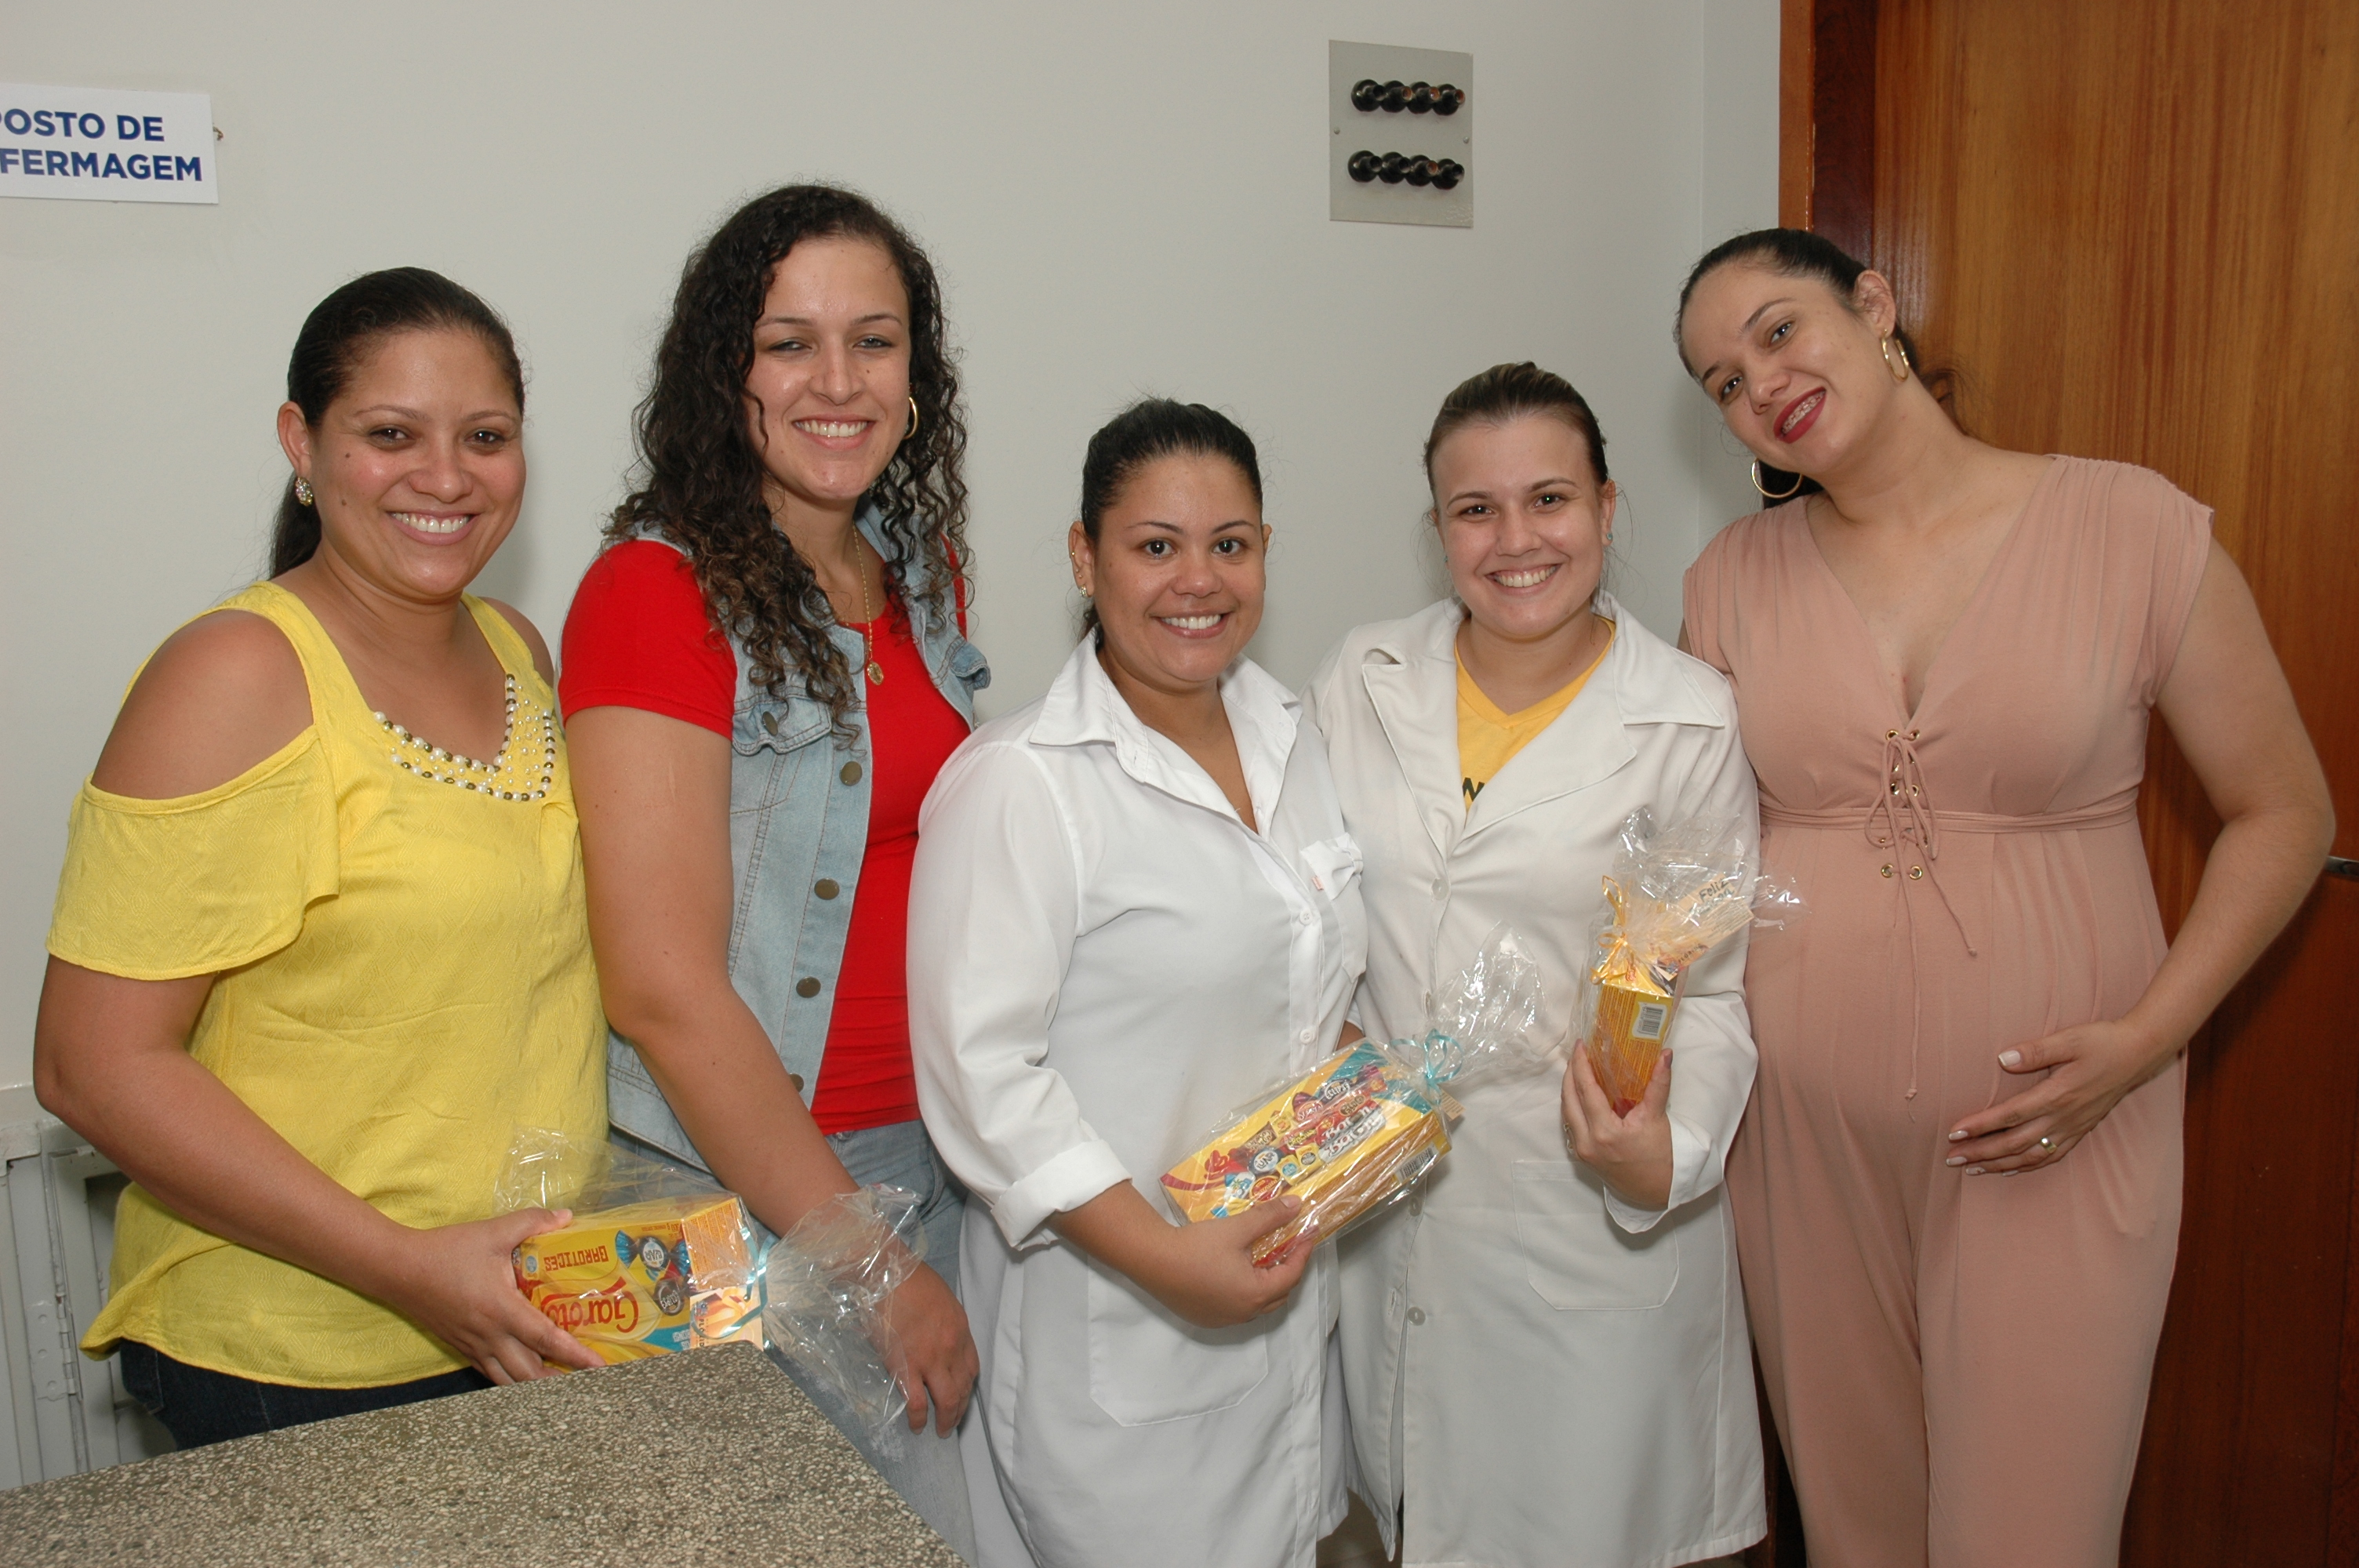 Prefeitura entrega de ovos de chocolate e caixas de bombom